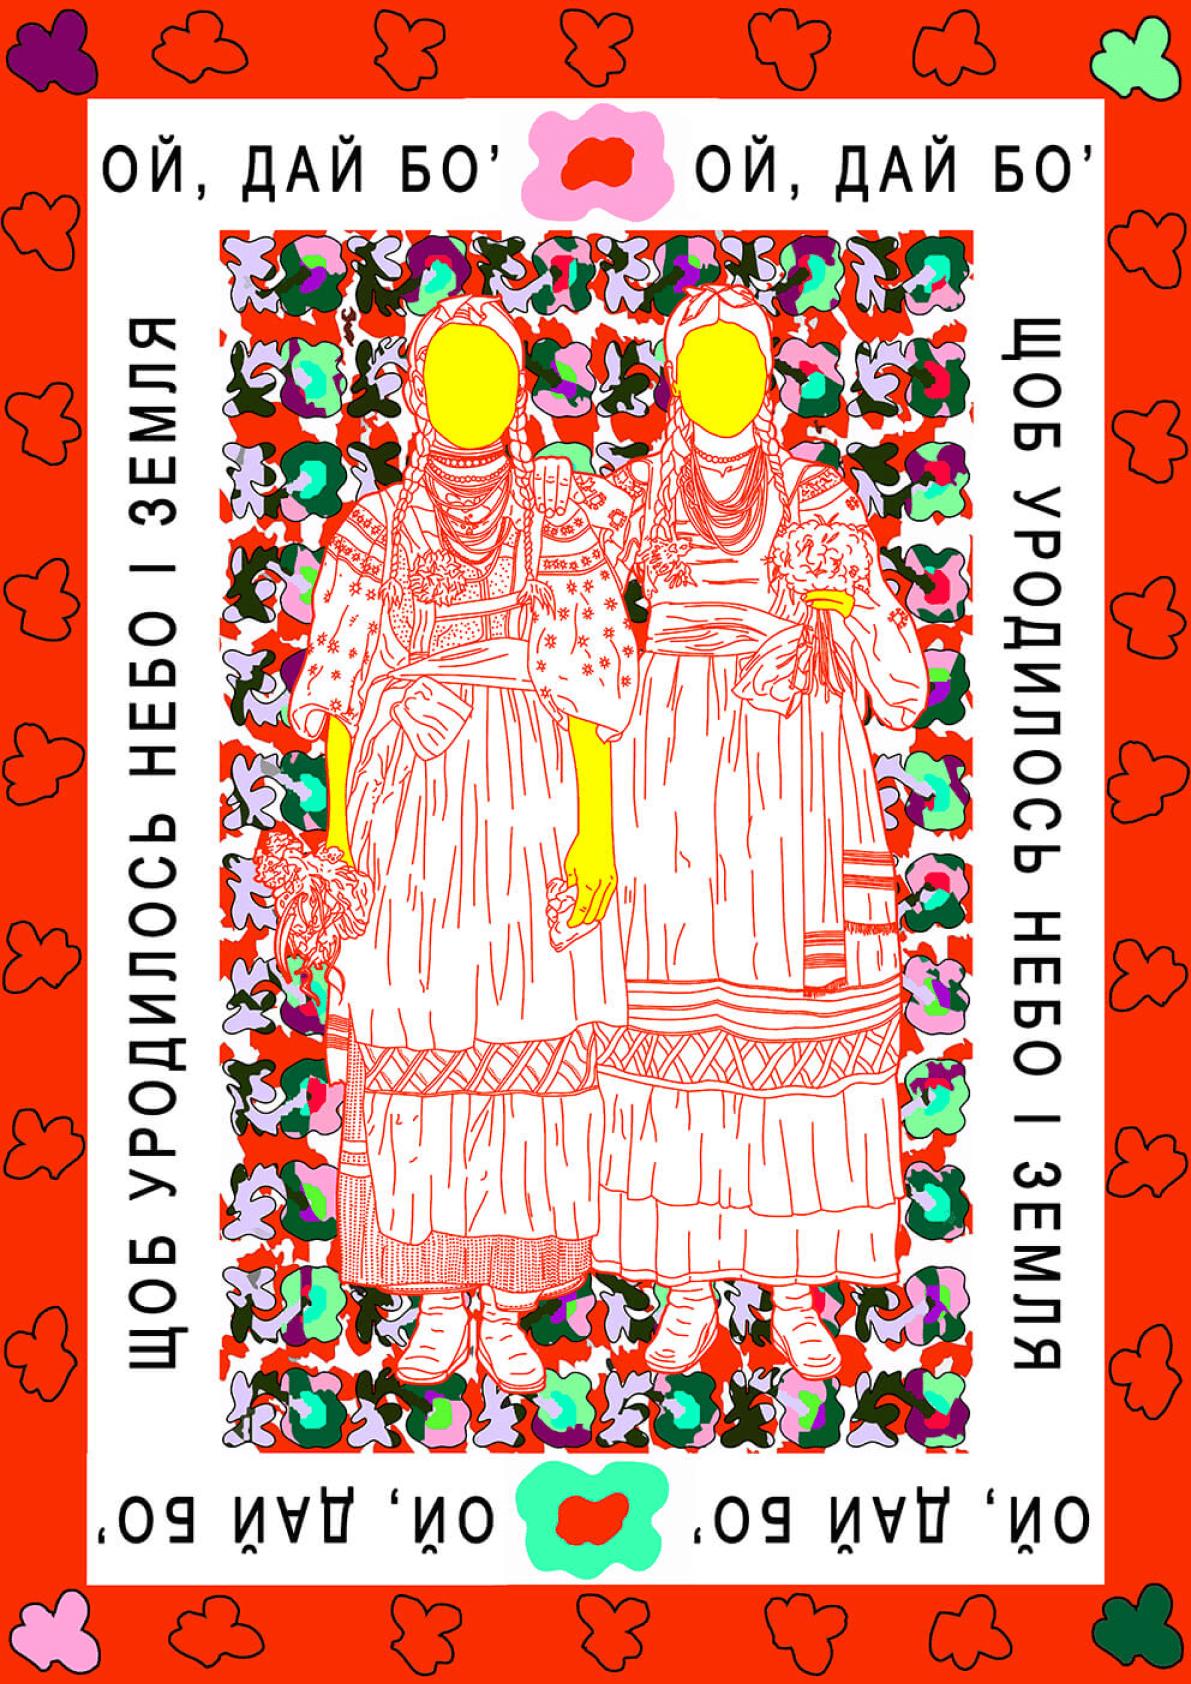 otog studio, poster, PORTAL exhibition at Kyiv City Council